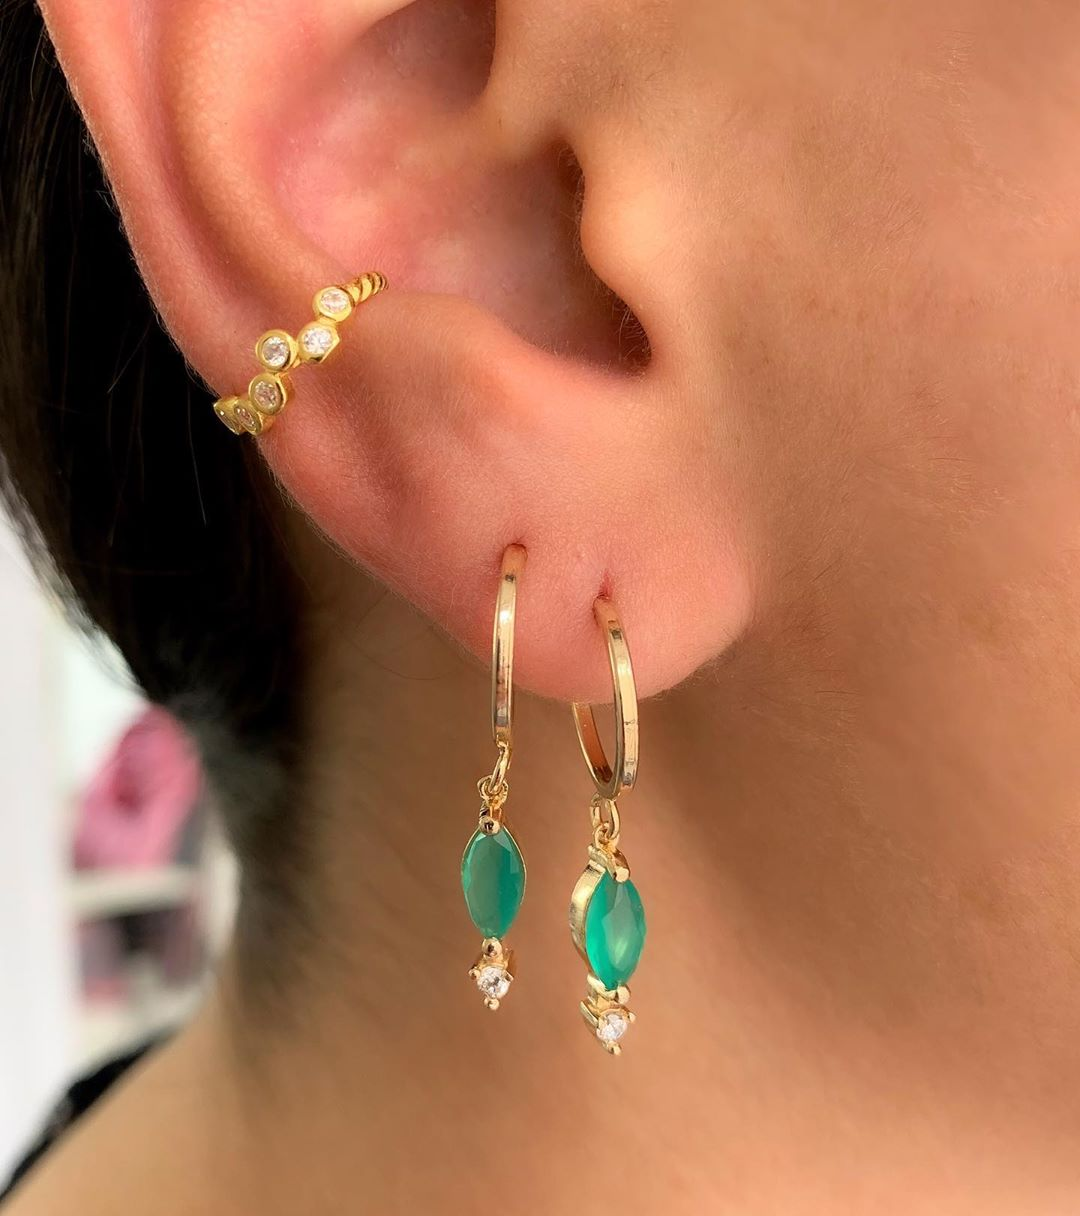 piercing de orelha delicadinho